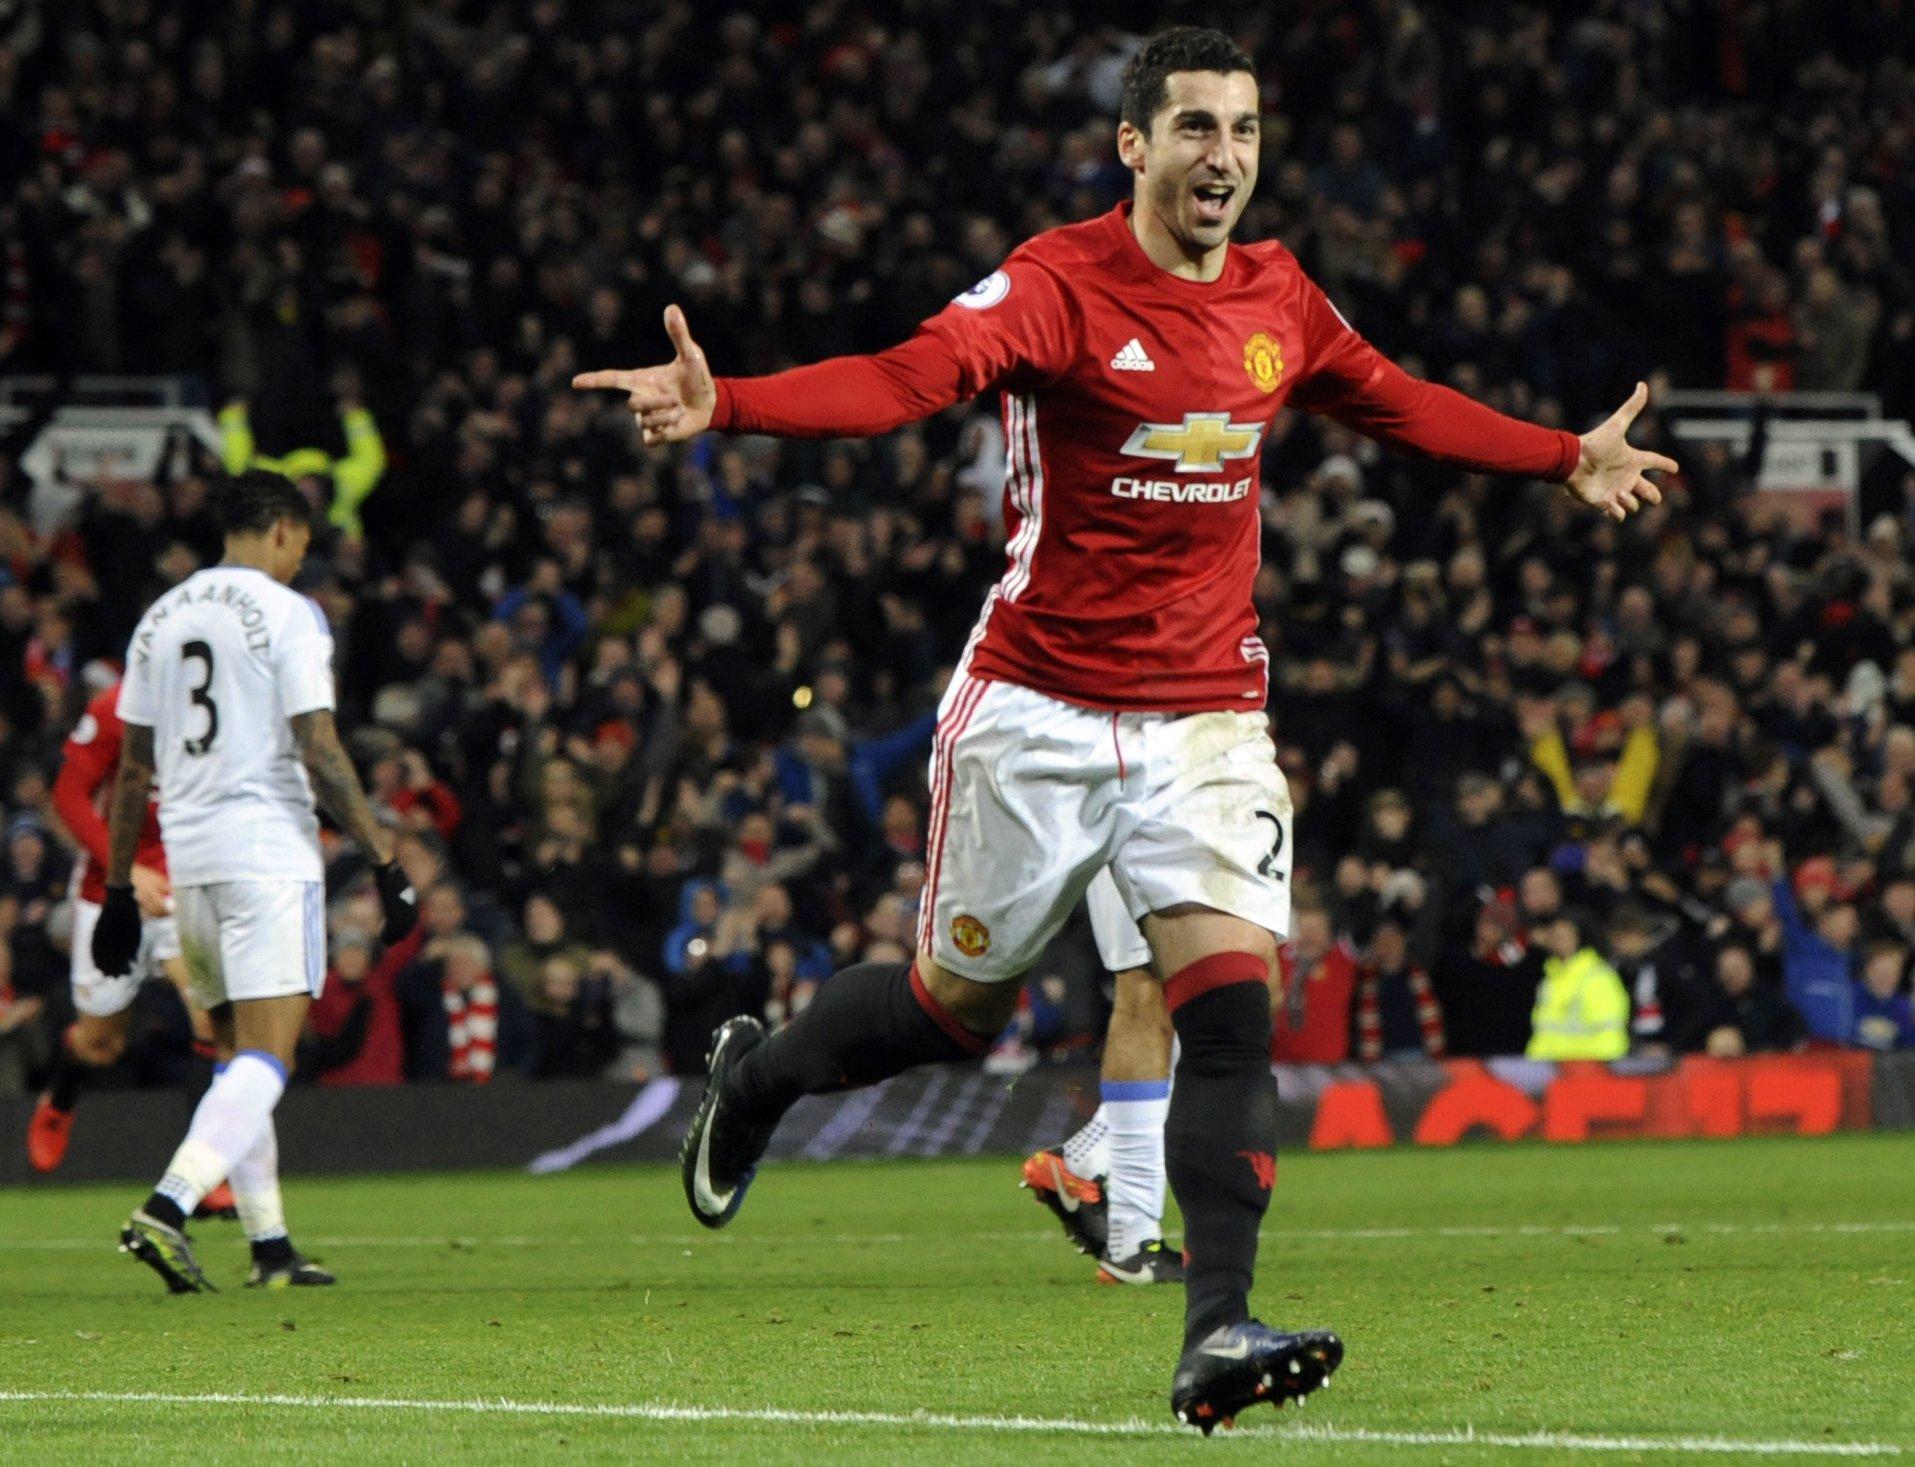 Mkhitaryan scores stunning goal as United beats Sunderland